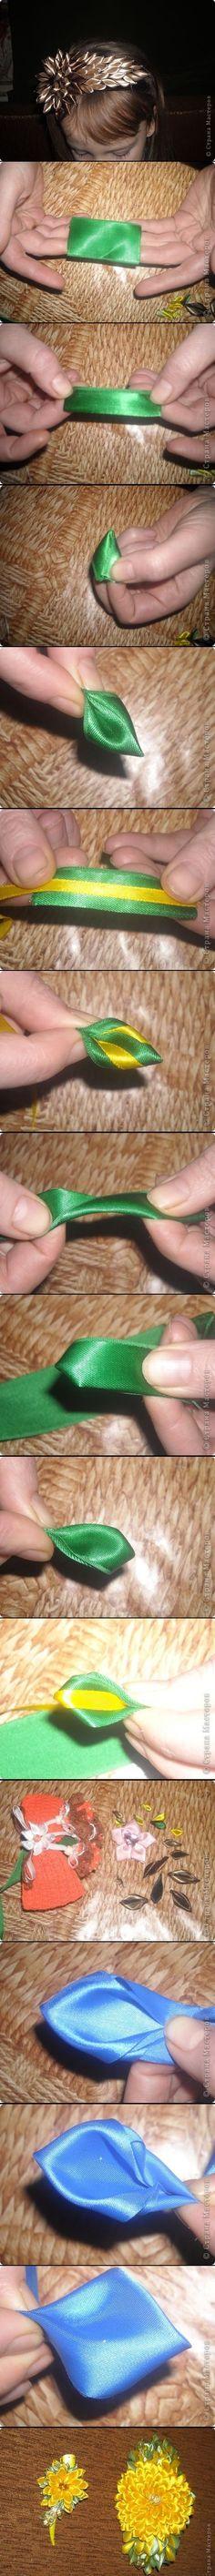 Fabulous DYI Advanced Headband Project - When you go PRO ! Grouped image by http://pinthemall.net